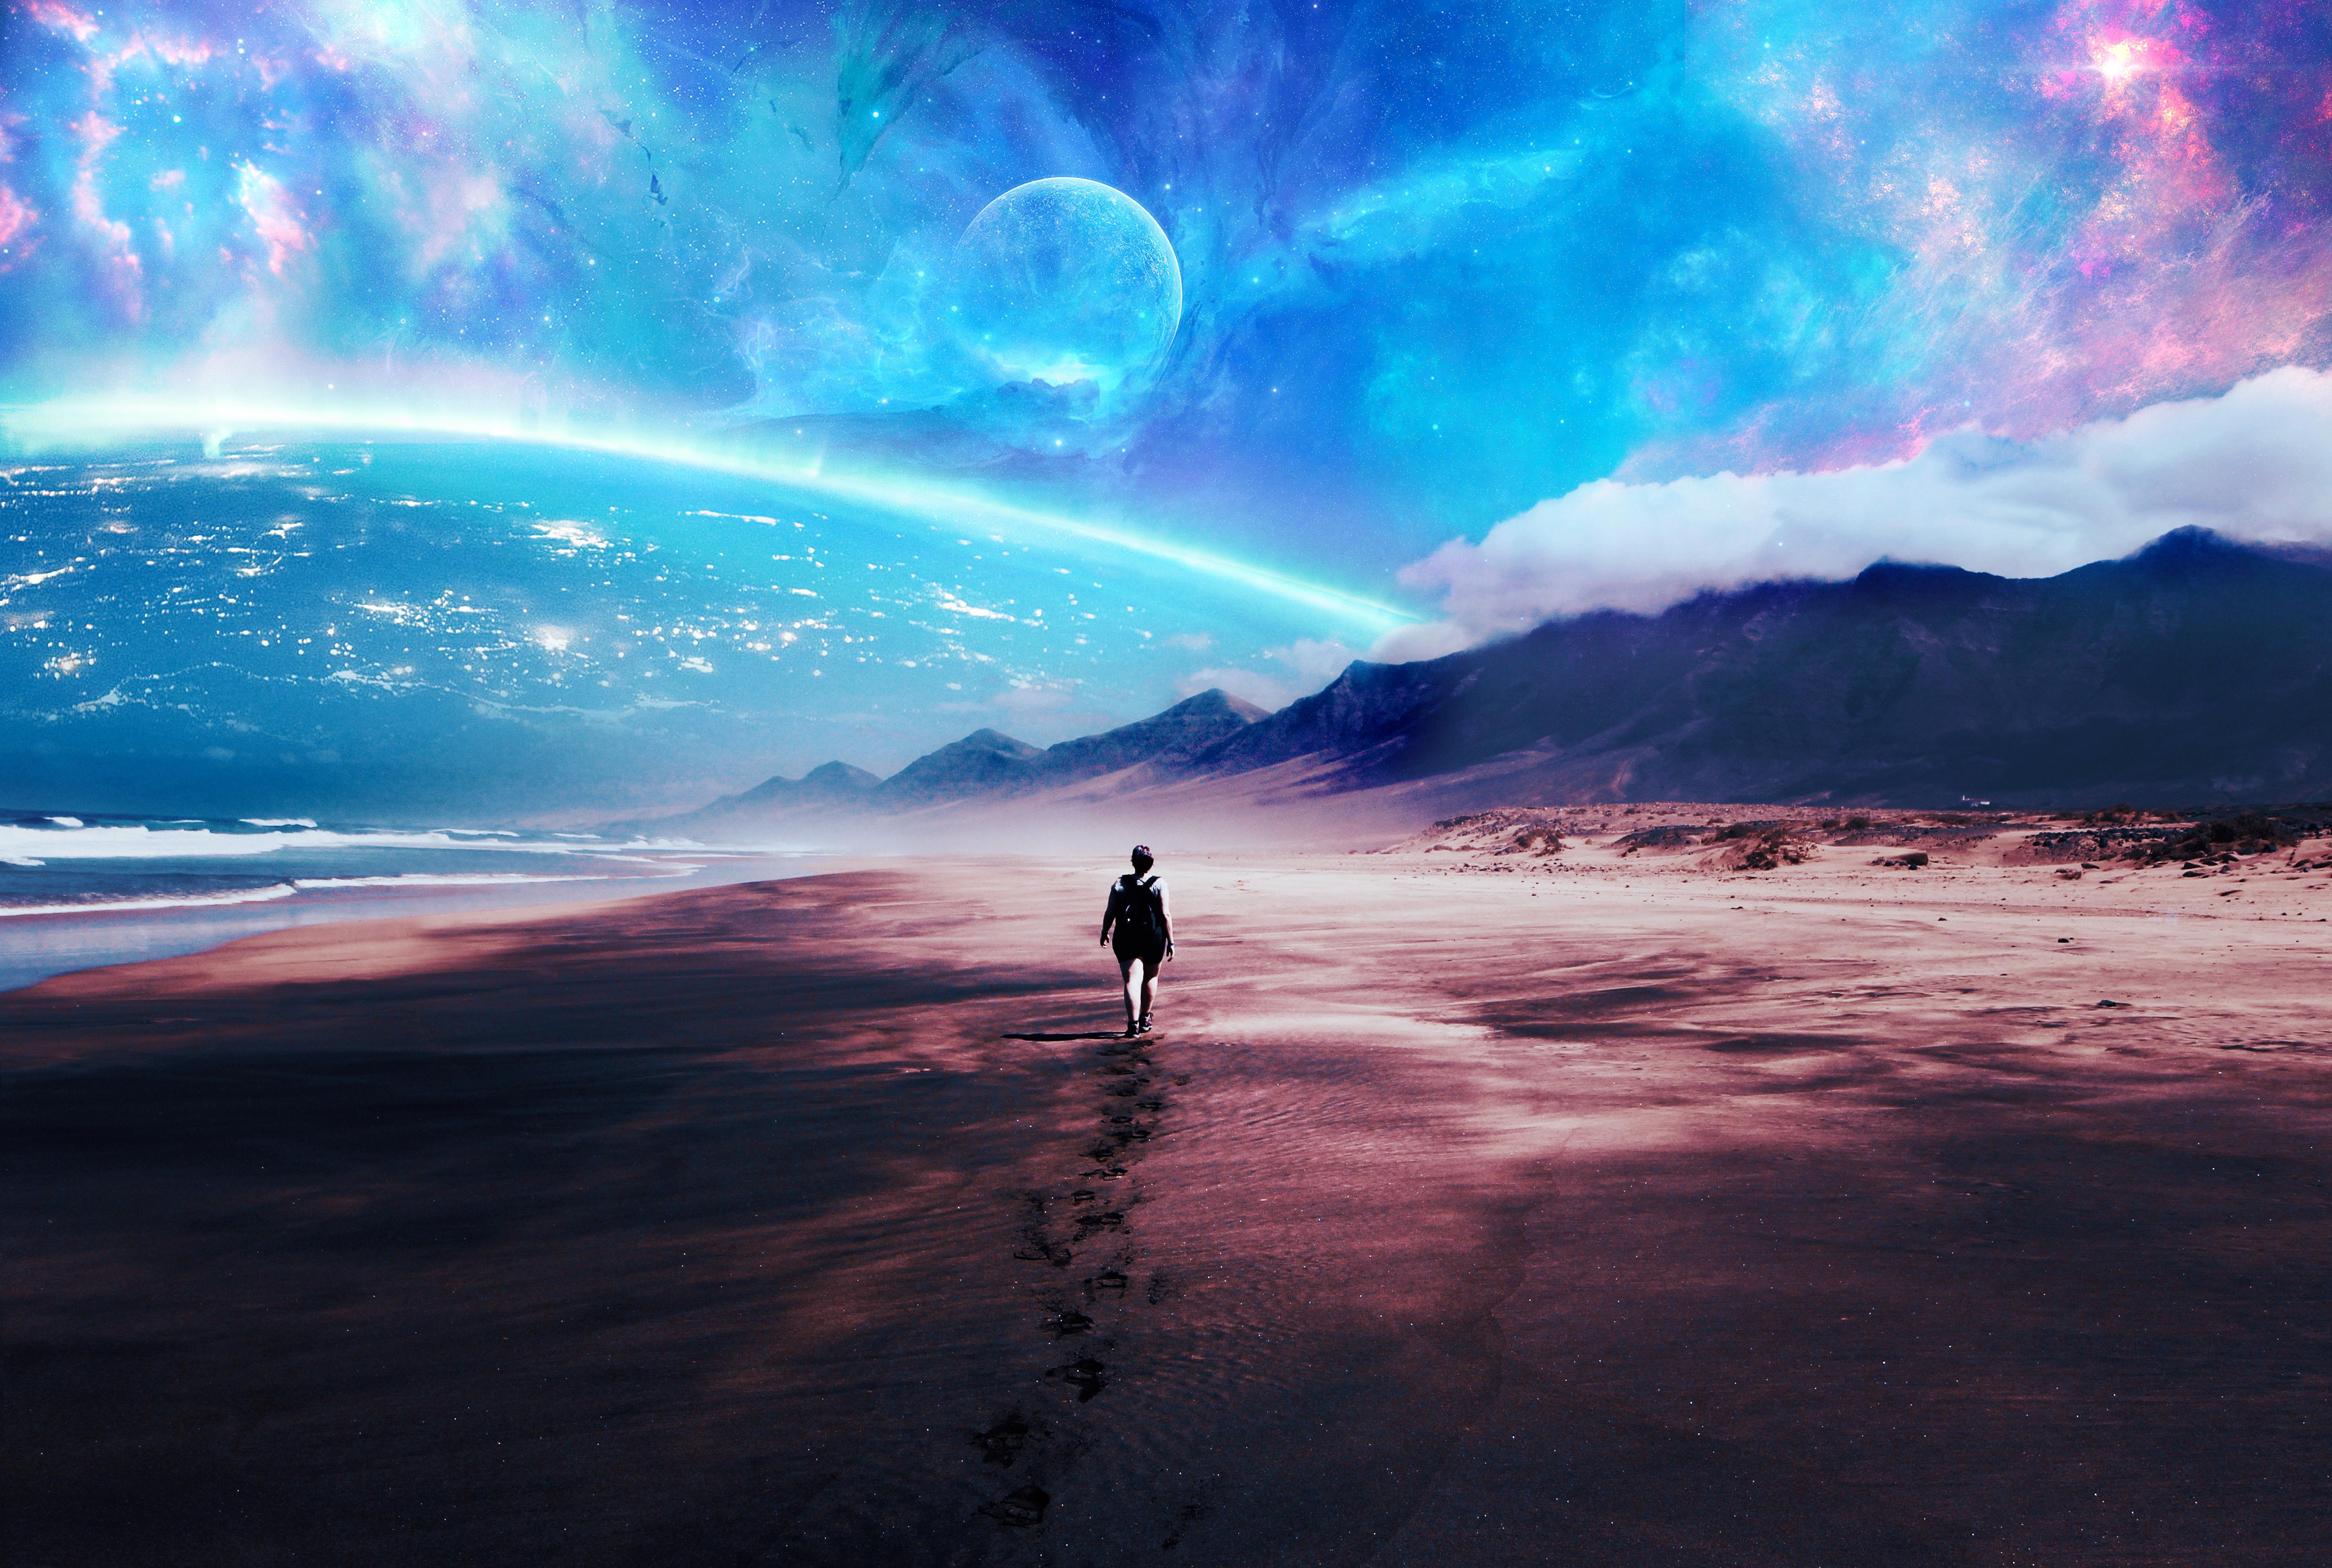 Alone 4k Wallpaper Beach Lost Exploration Travel Surreal Fantasy 1151